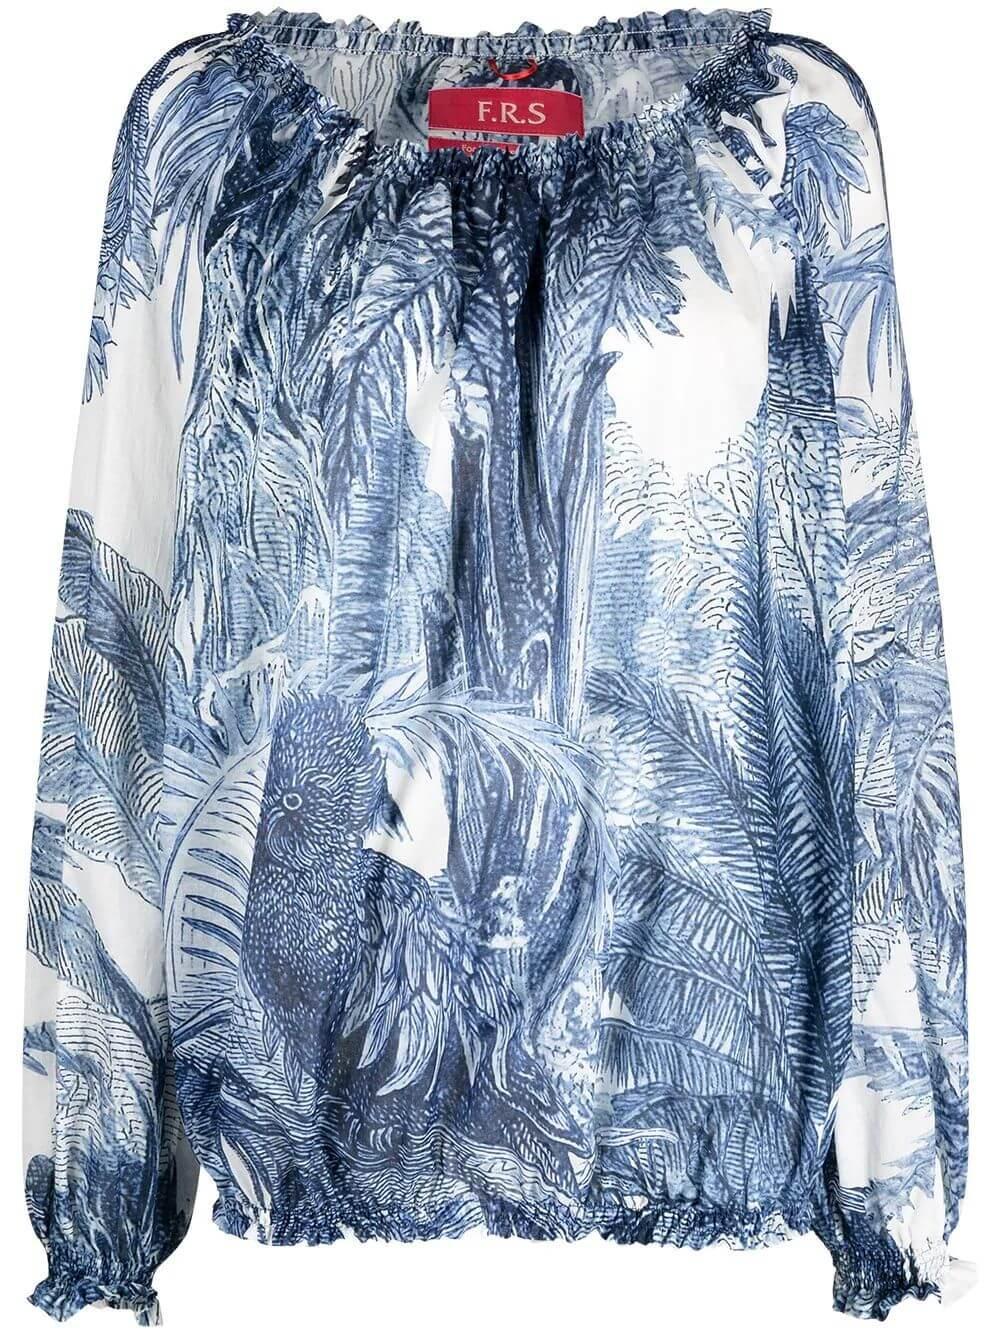 Foliage Printed Cotton Top